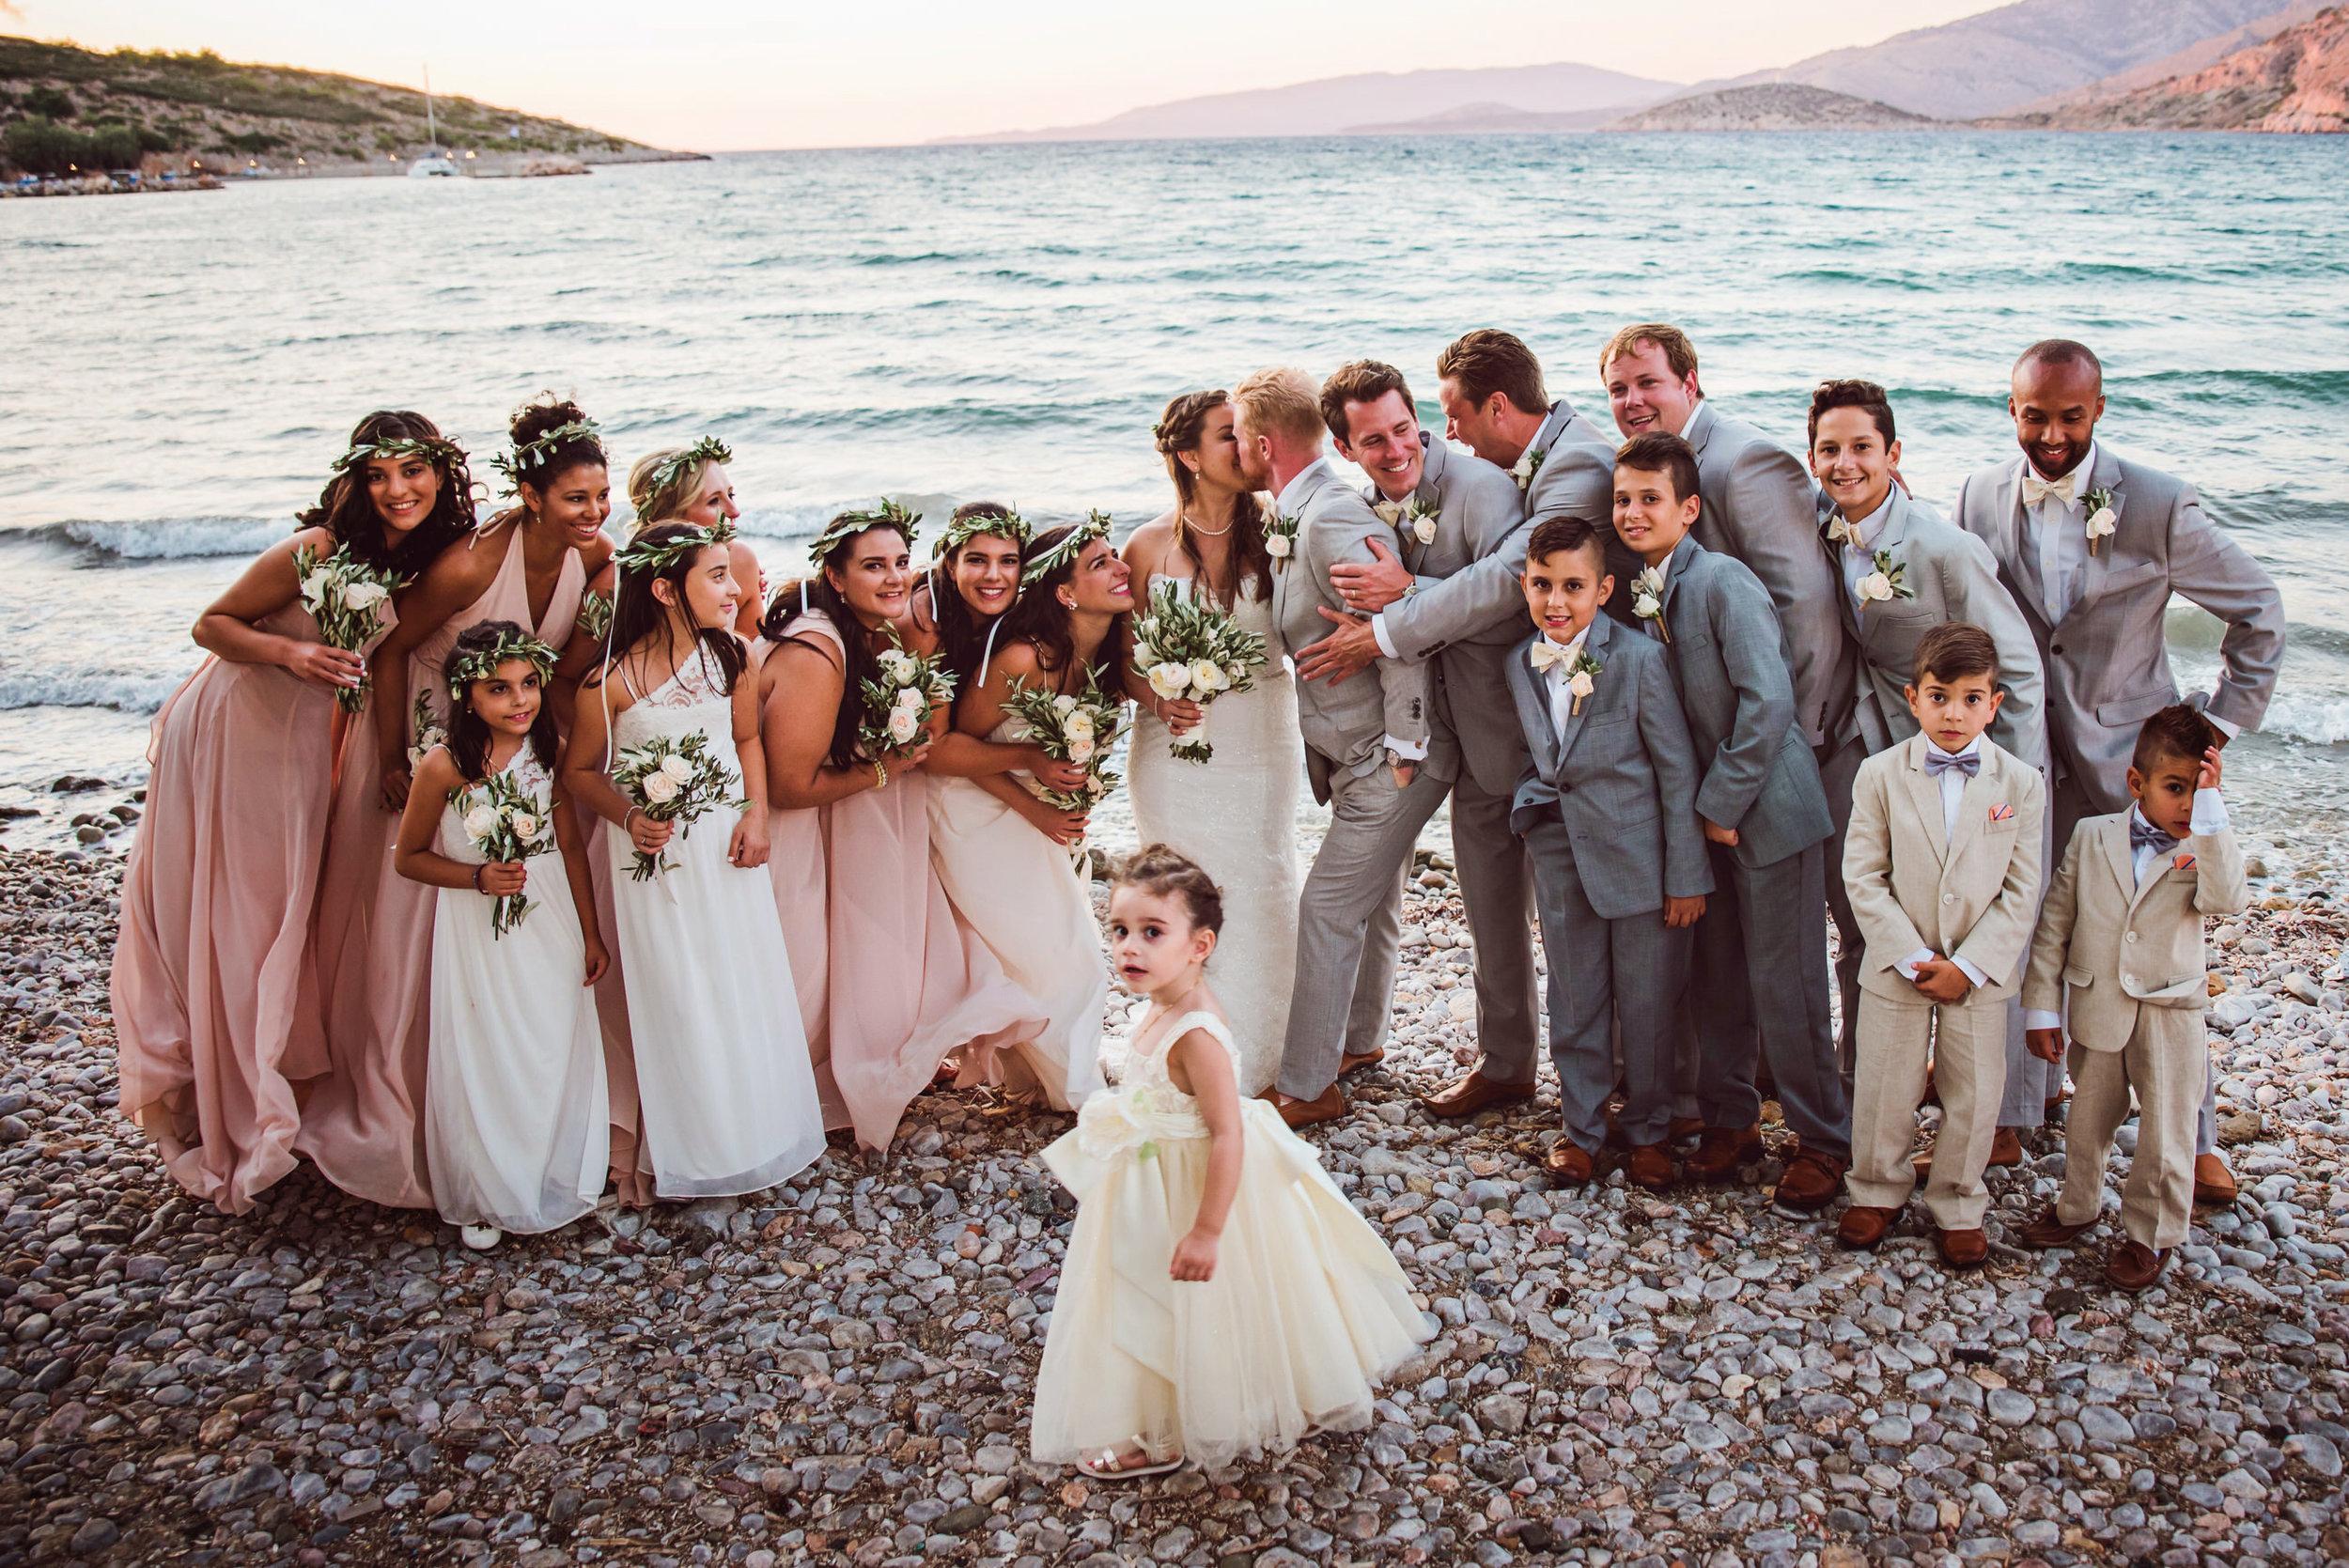 ChiosGreeceWedding-Trisha&Will-WeddingParty-Family-115.jpg